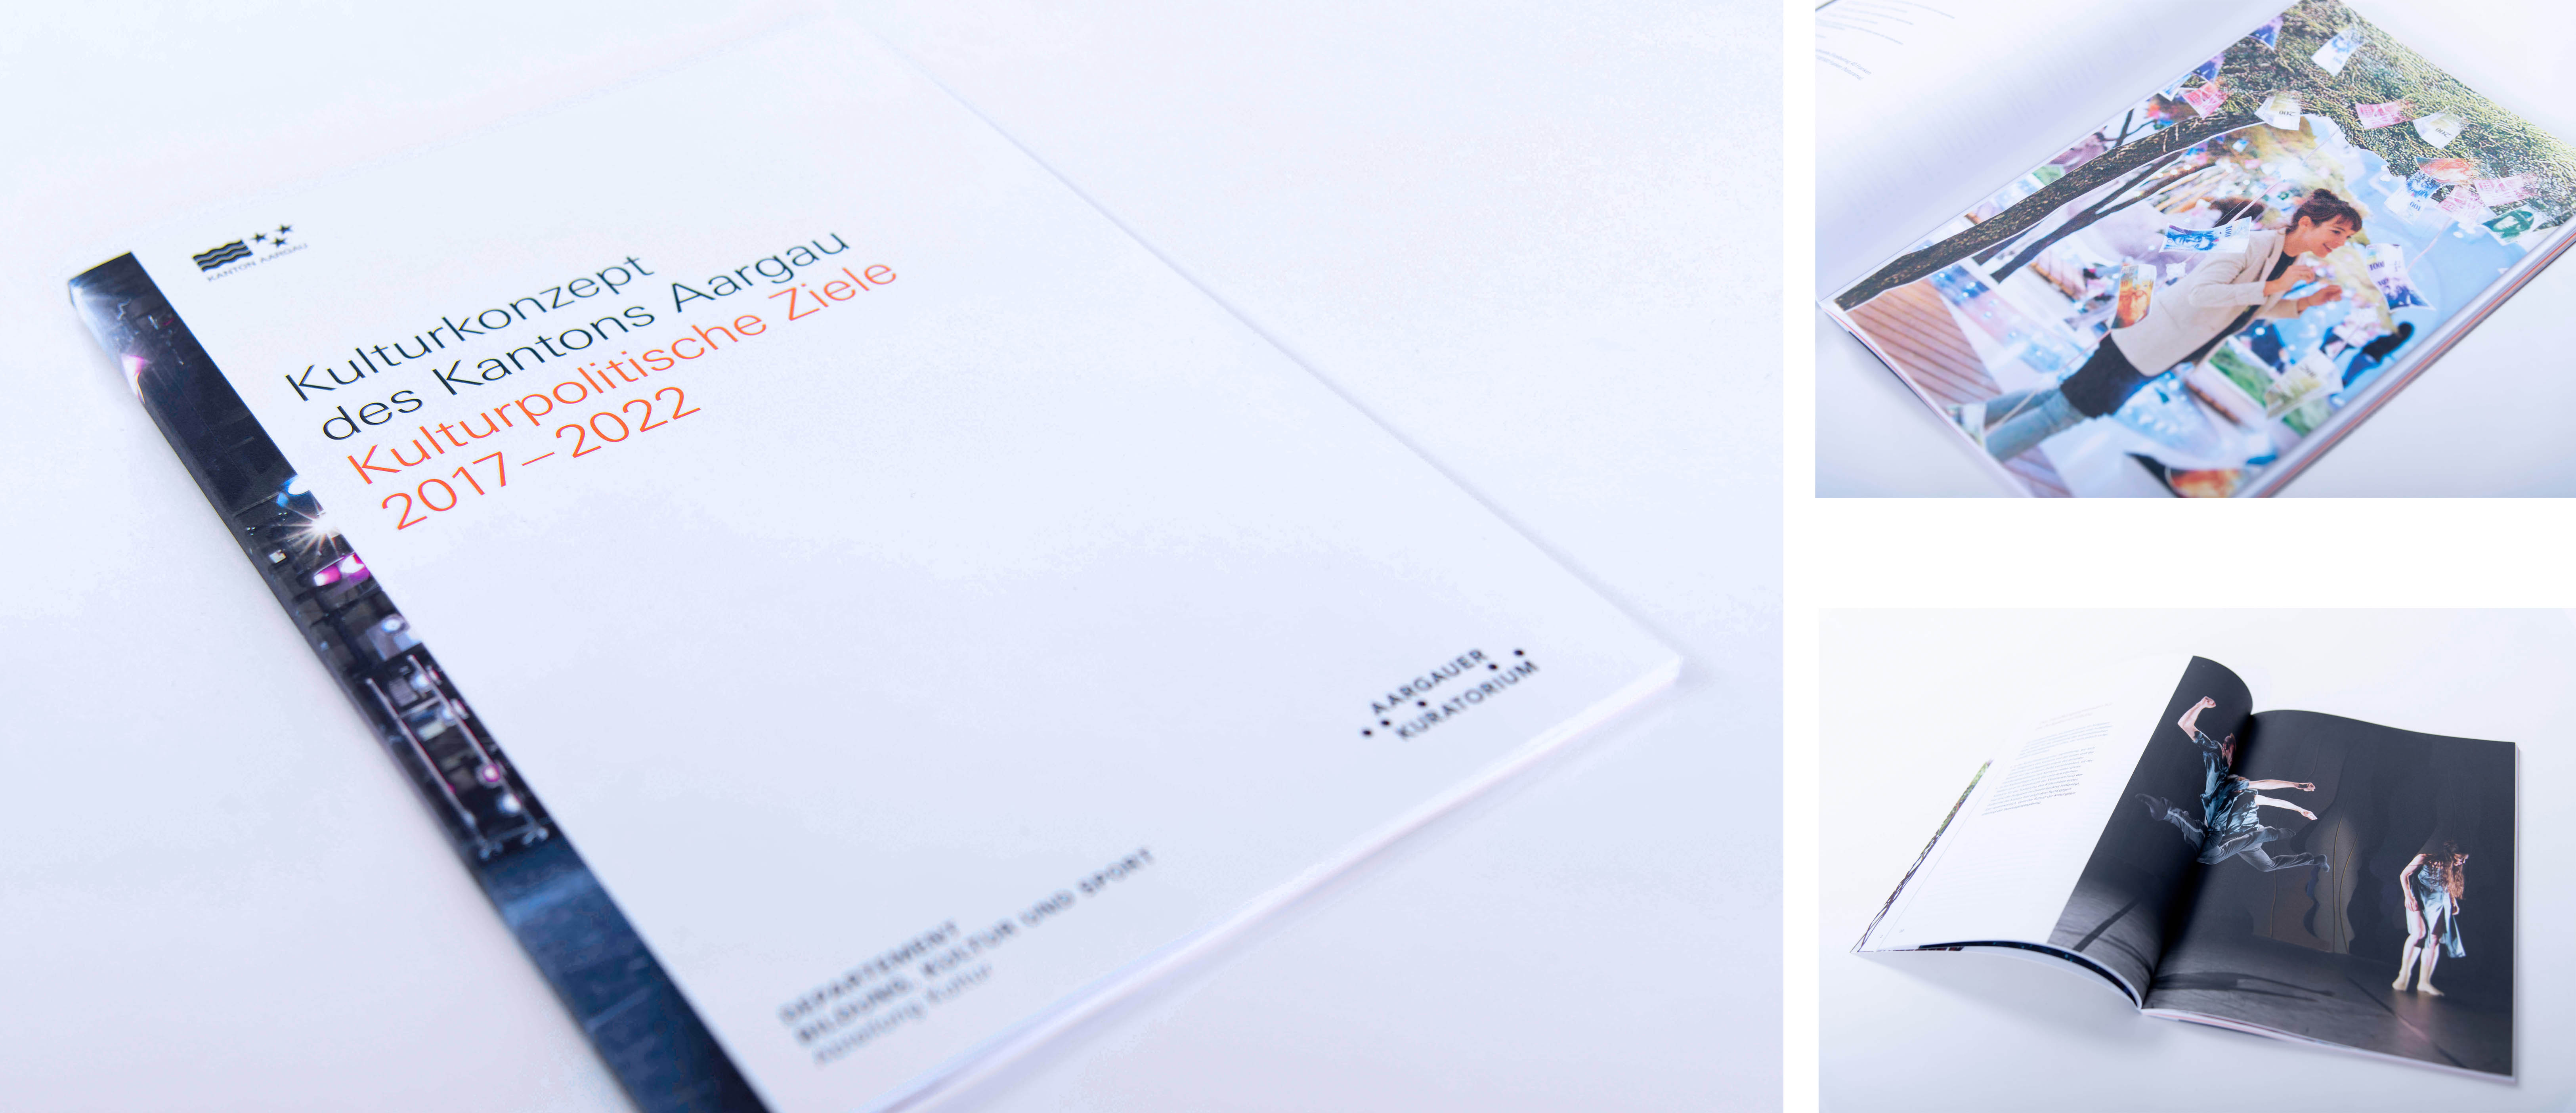 Kanton Aargau – Kulturkonzept 2017-2022, Editorial Design